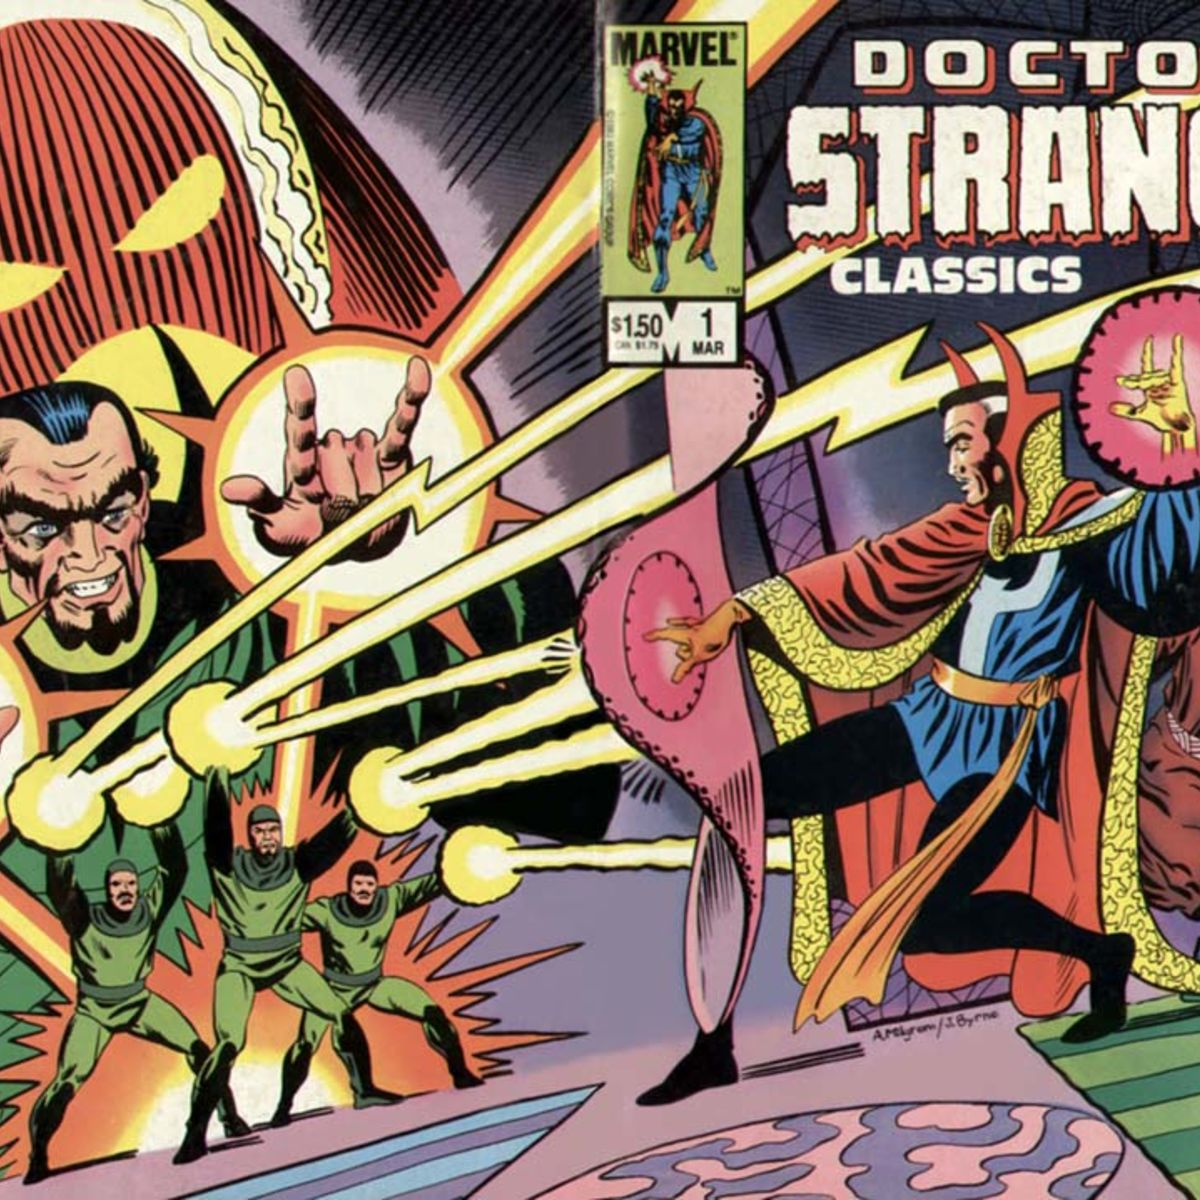 Doctor_Strange_Classics_Vol_1_1_Wraparound.jpg